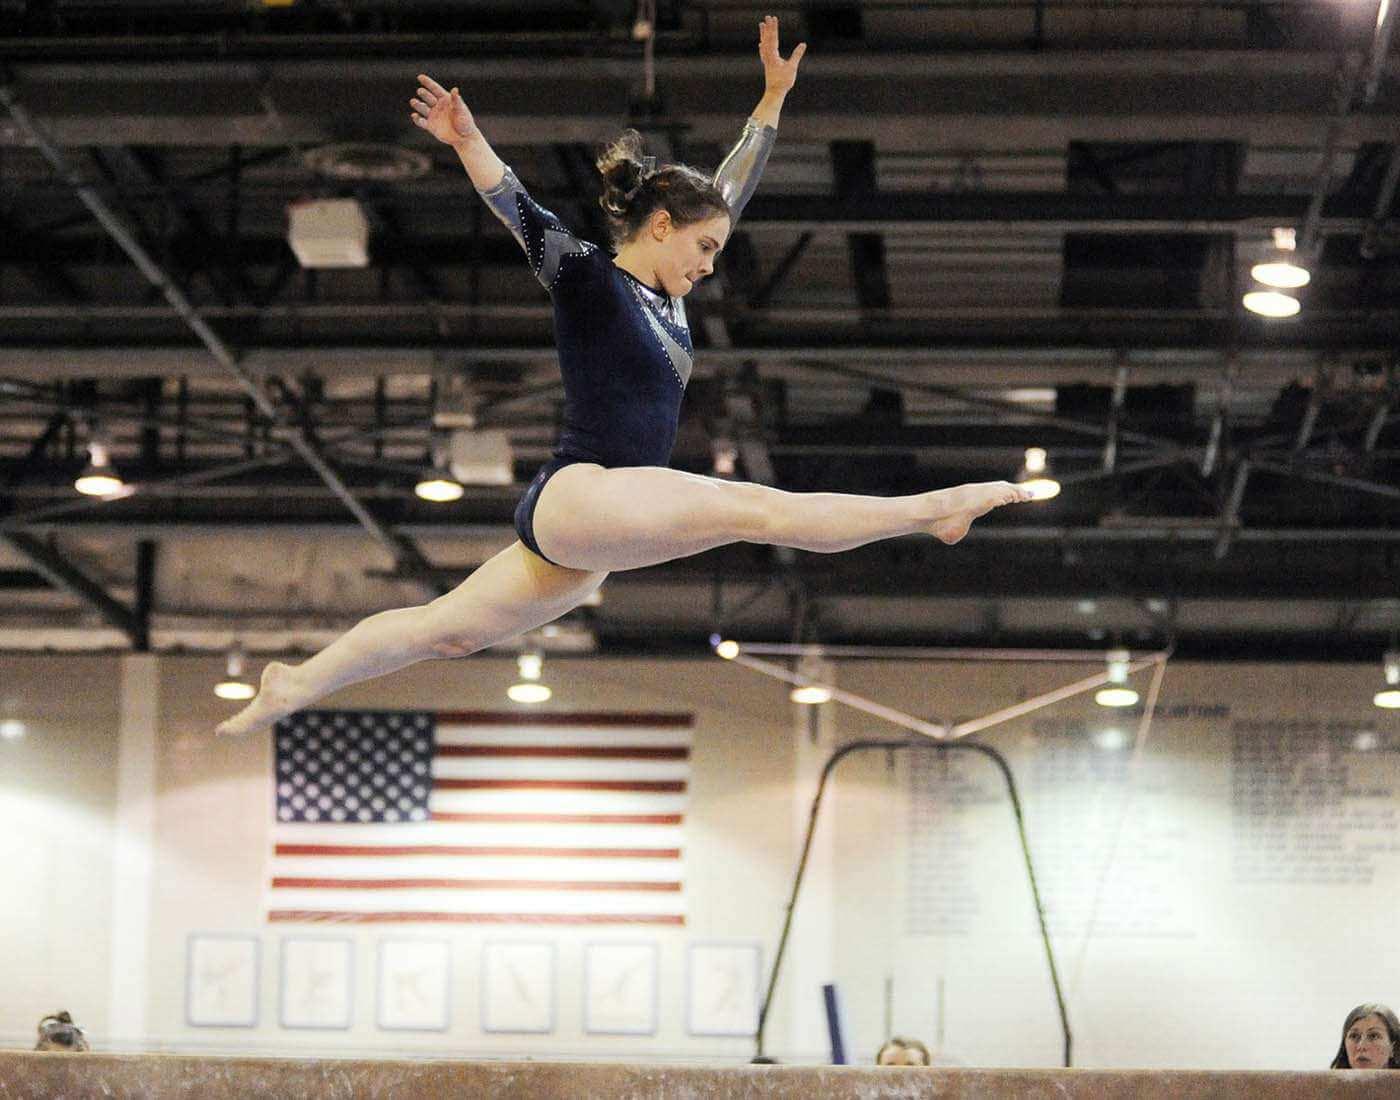 https://sportsmatik.com/uploads/matik-sports-corner/matik-know-how/gymnastics_1493727512_96096.jpg